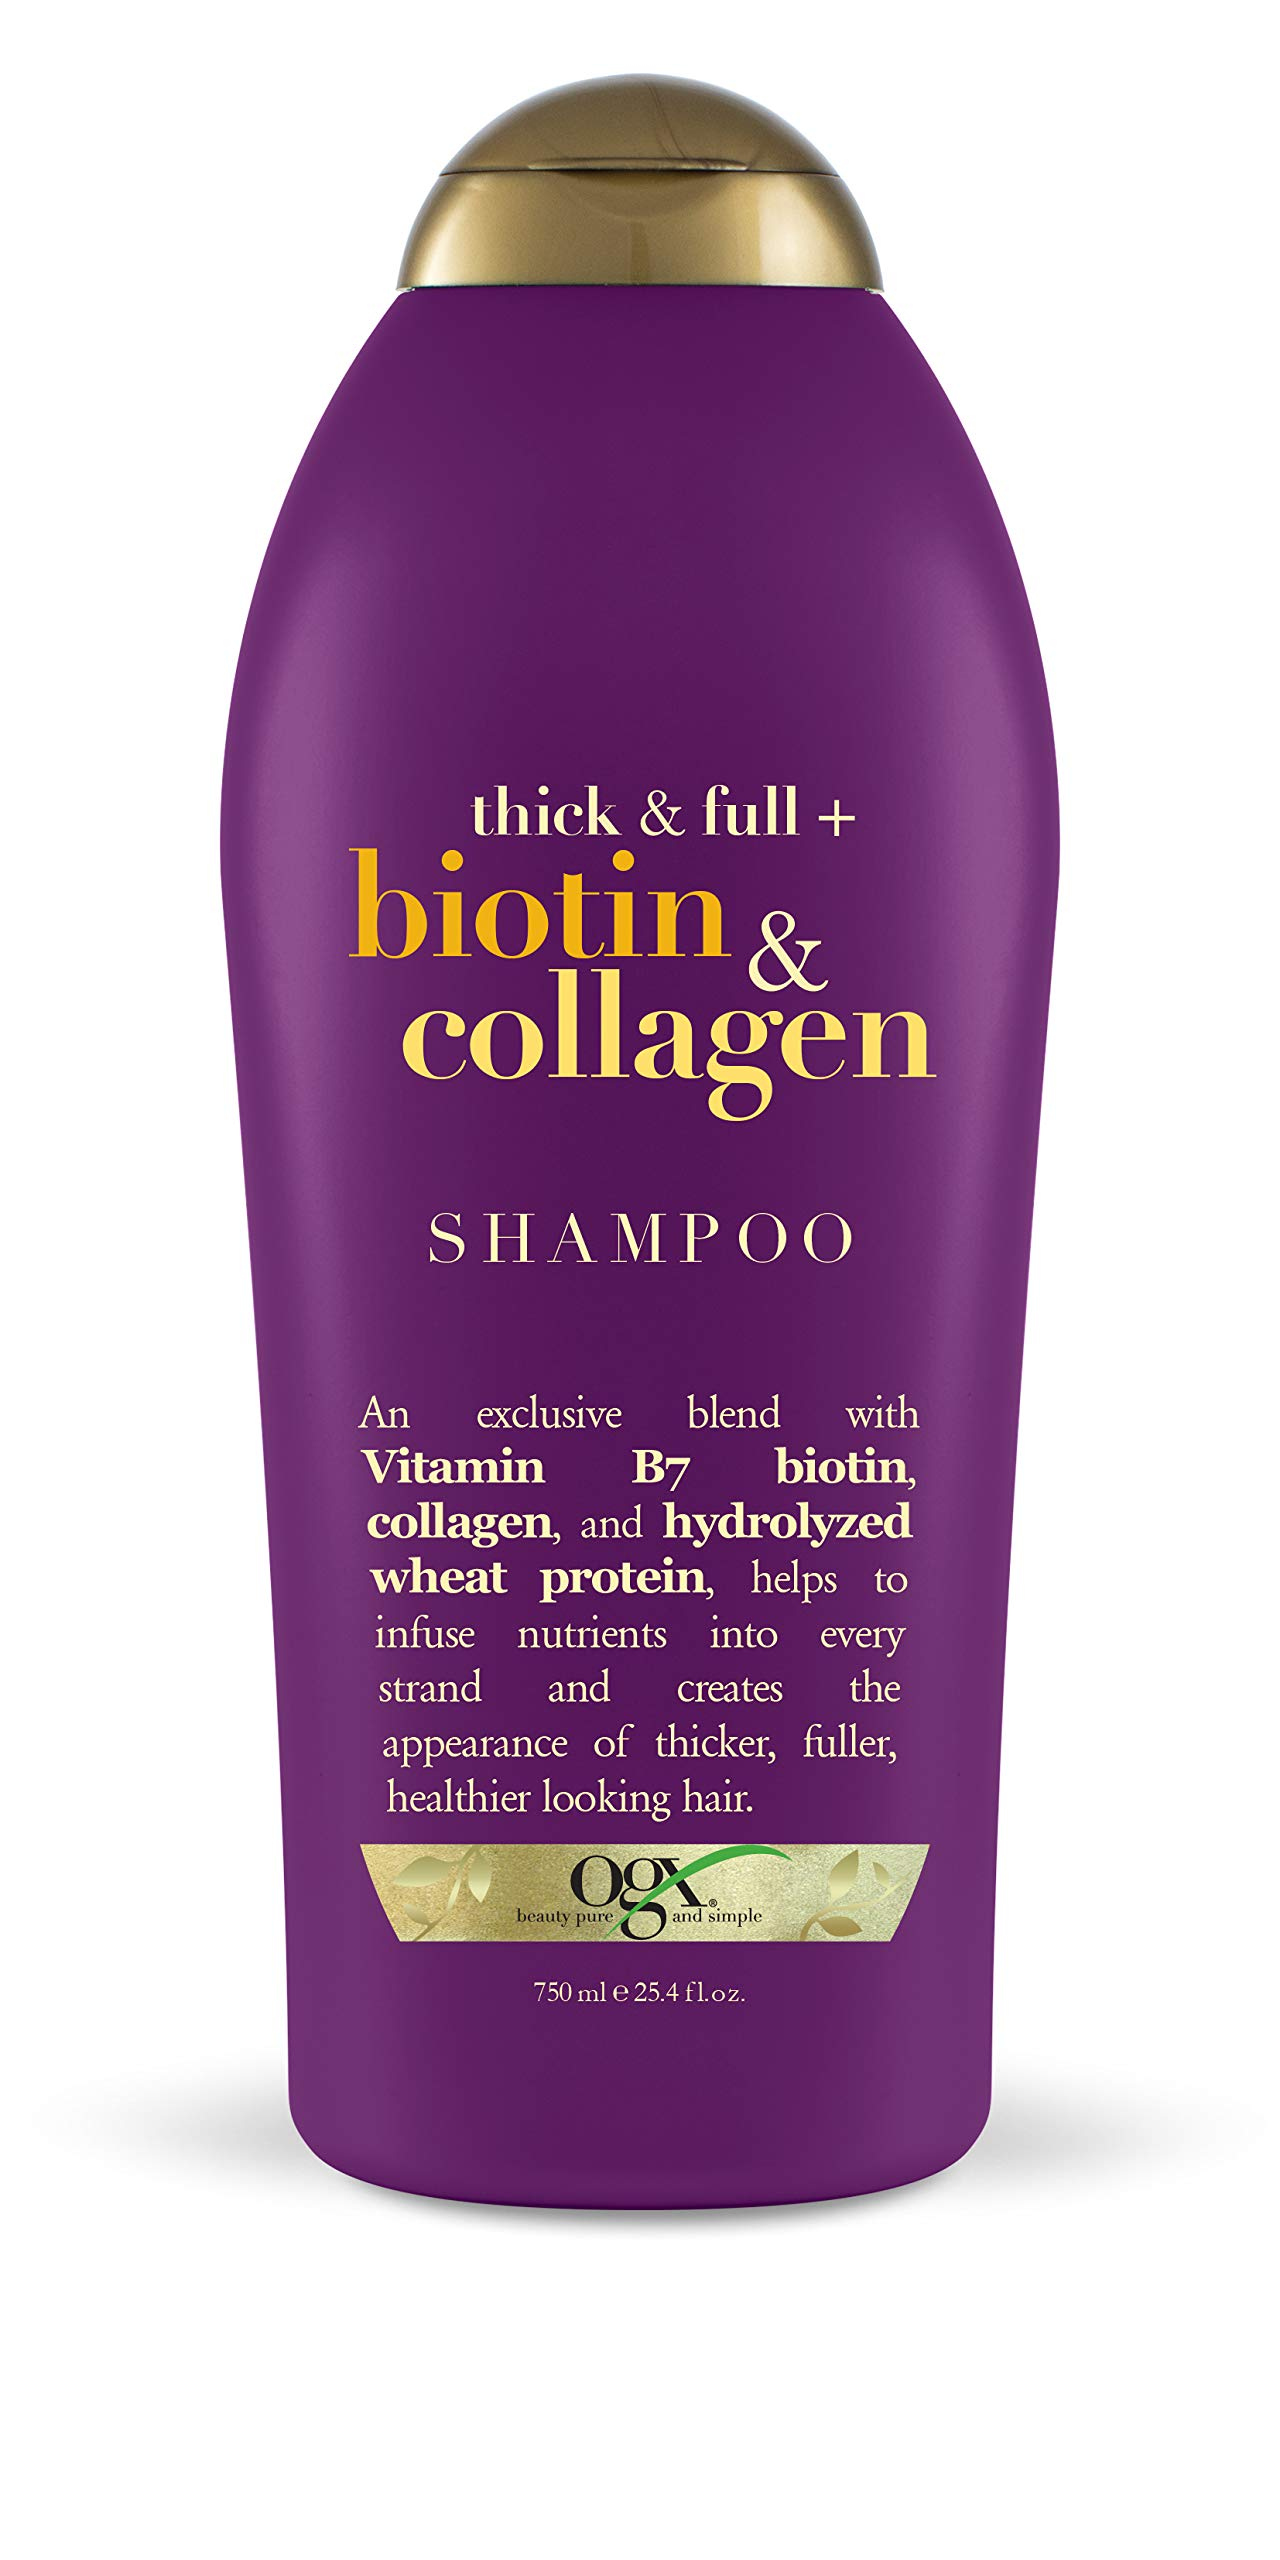 OGX Salon Size Thick and Full Biotin Shampoo, 25.4 Ounce